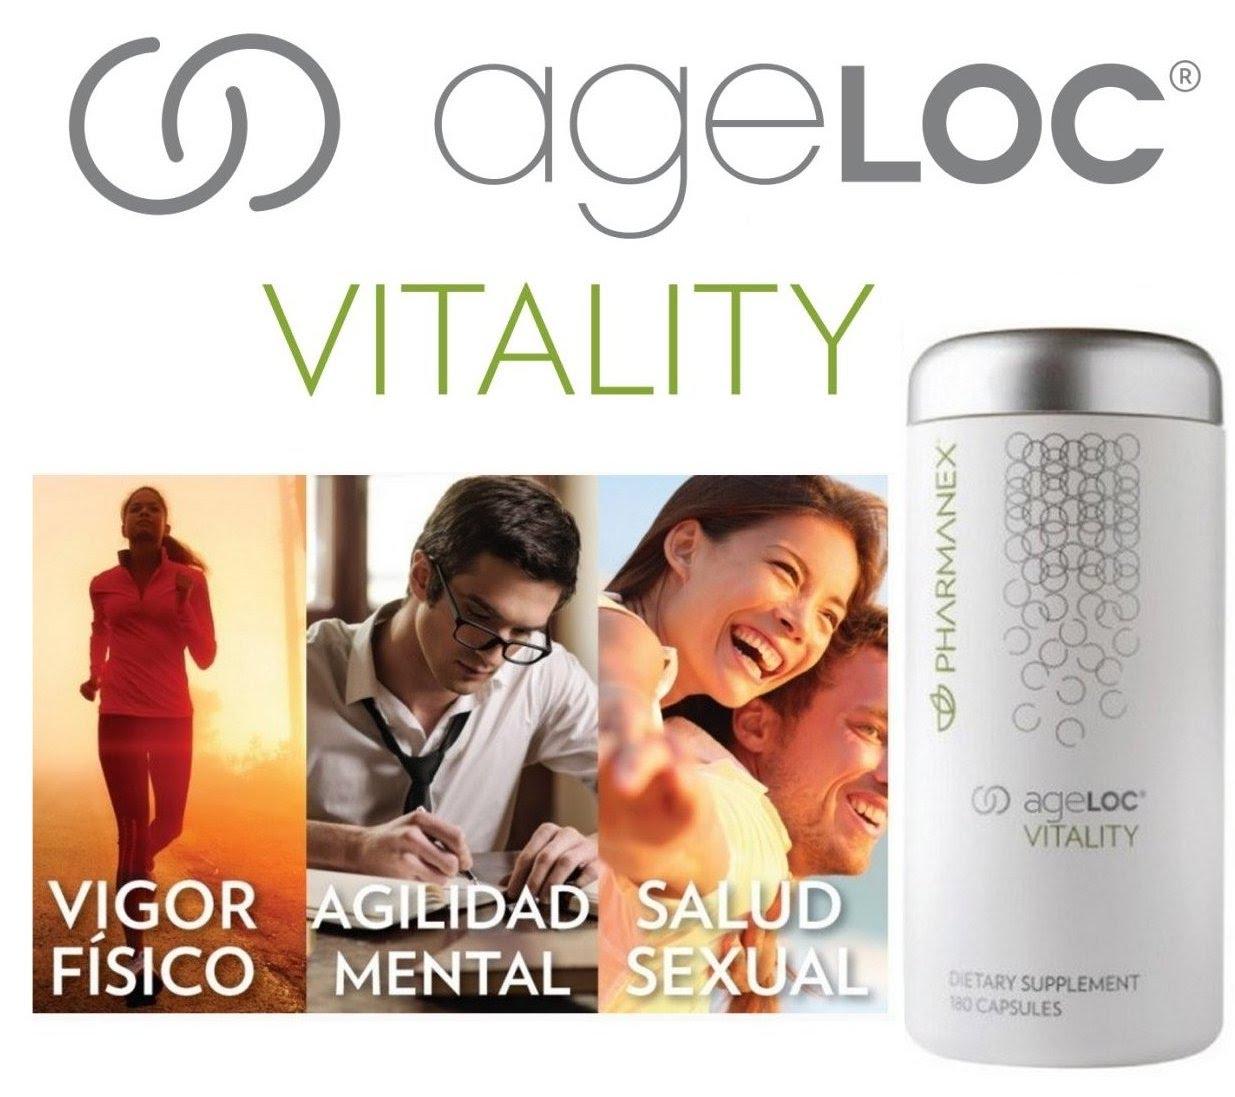 AgeLOC Vitality NuKkin - 180 CAPSULES 2